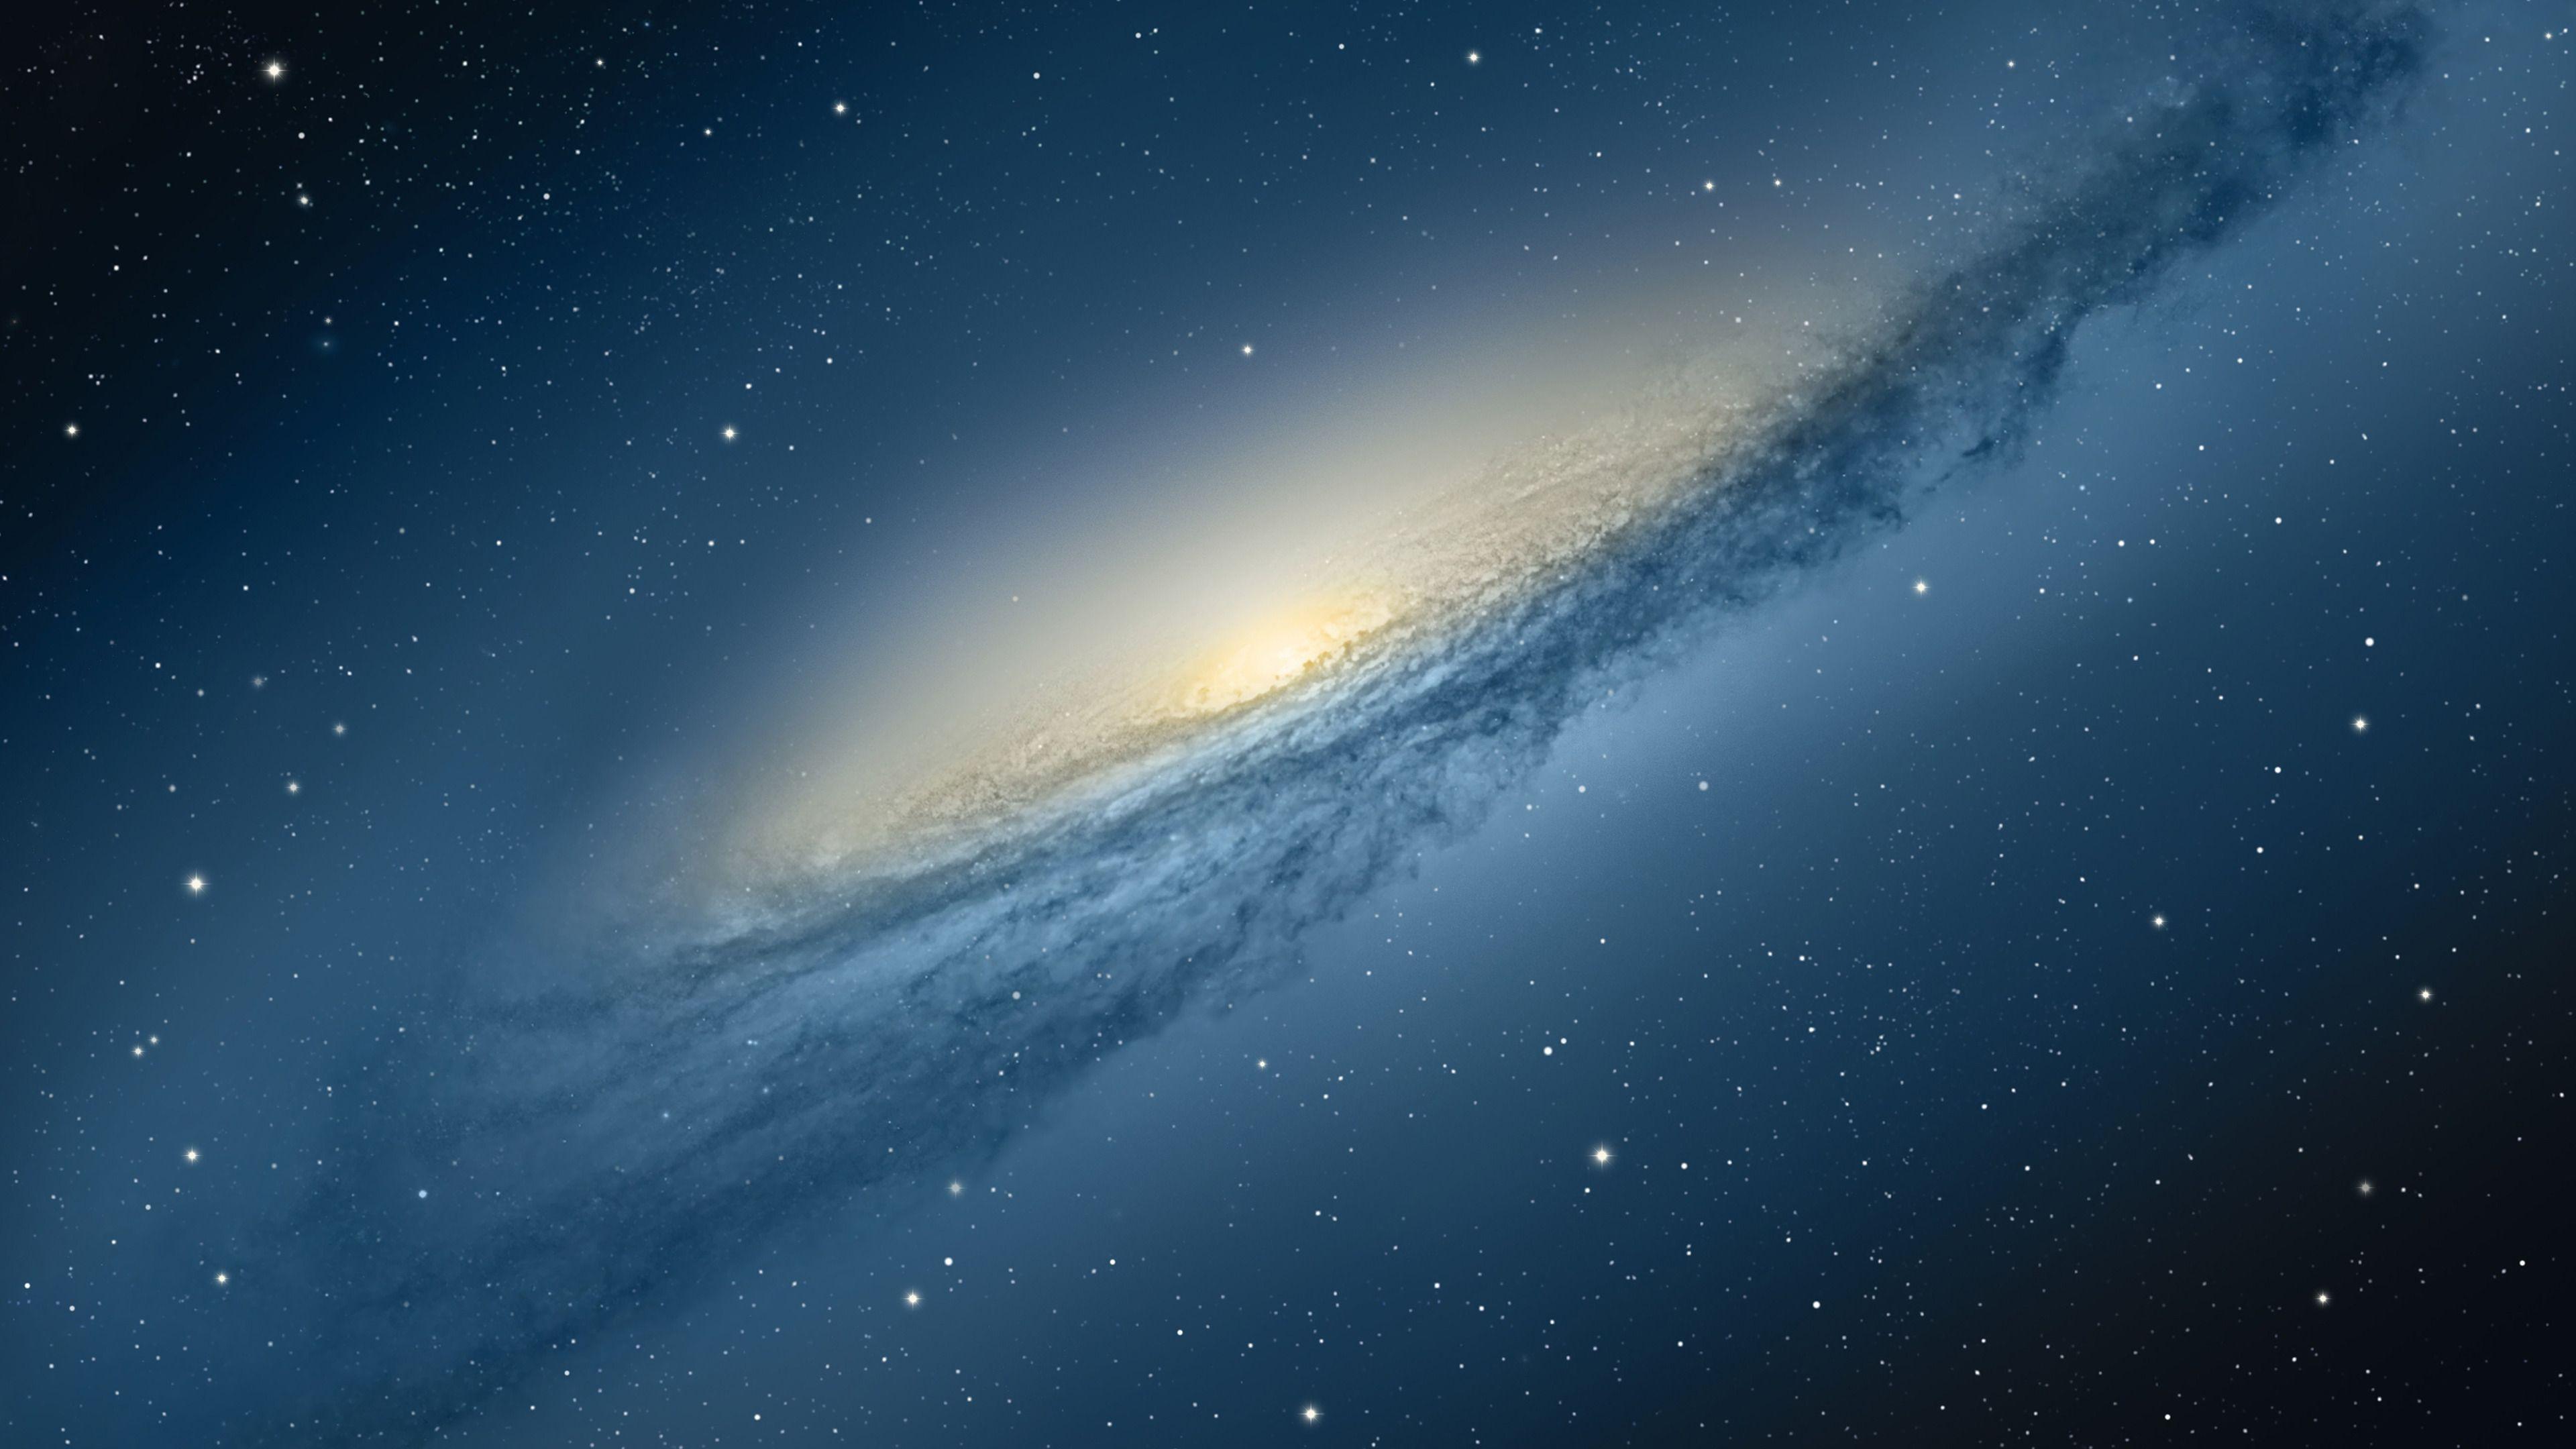 Cosmos Y Arte Digital 80 Imagenes Full Hd Galaxy Wallpaper Ultra Hd 4k Wallpaper Computer Wallpaper